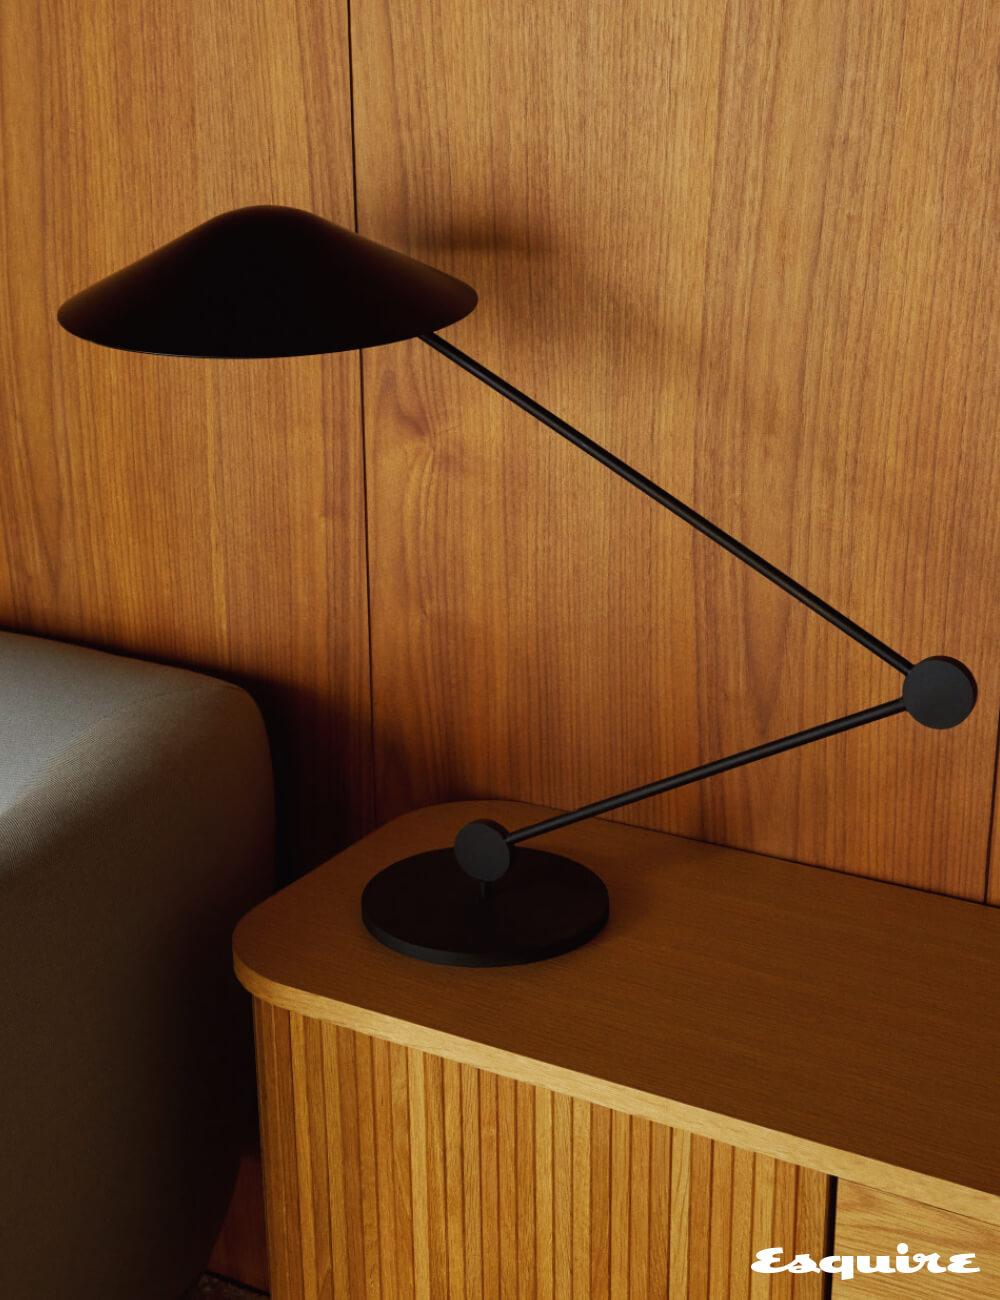 MOSS lamp by Kyuhyung Cho